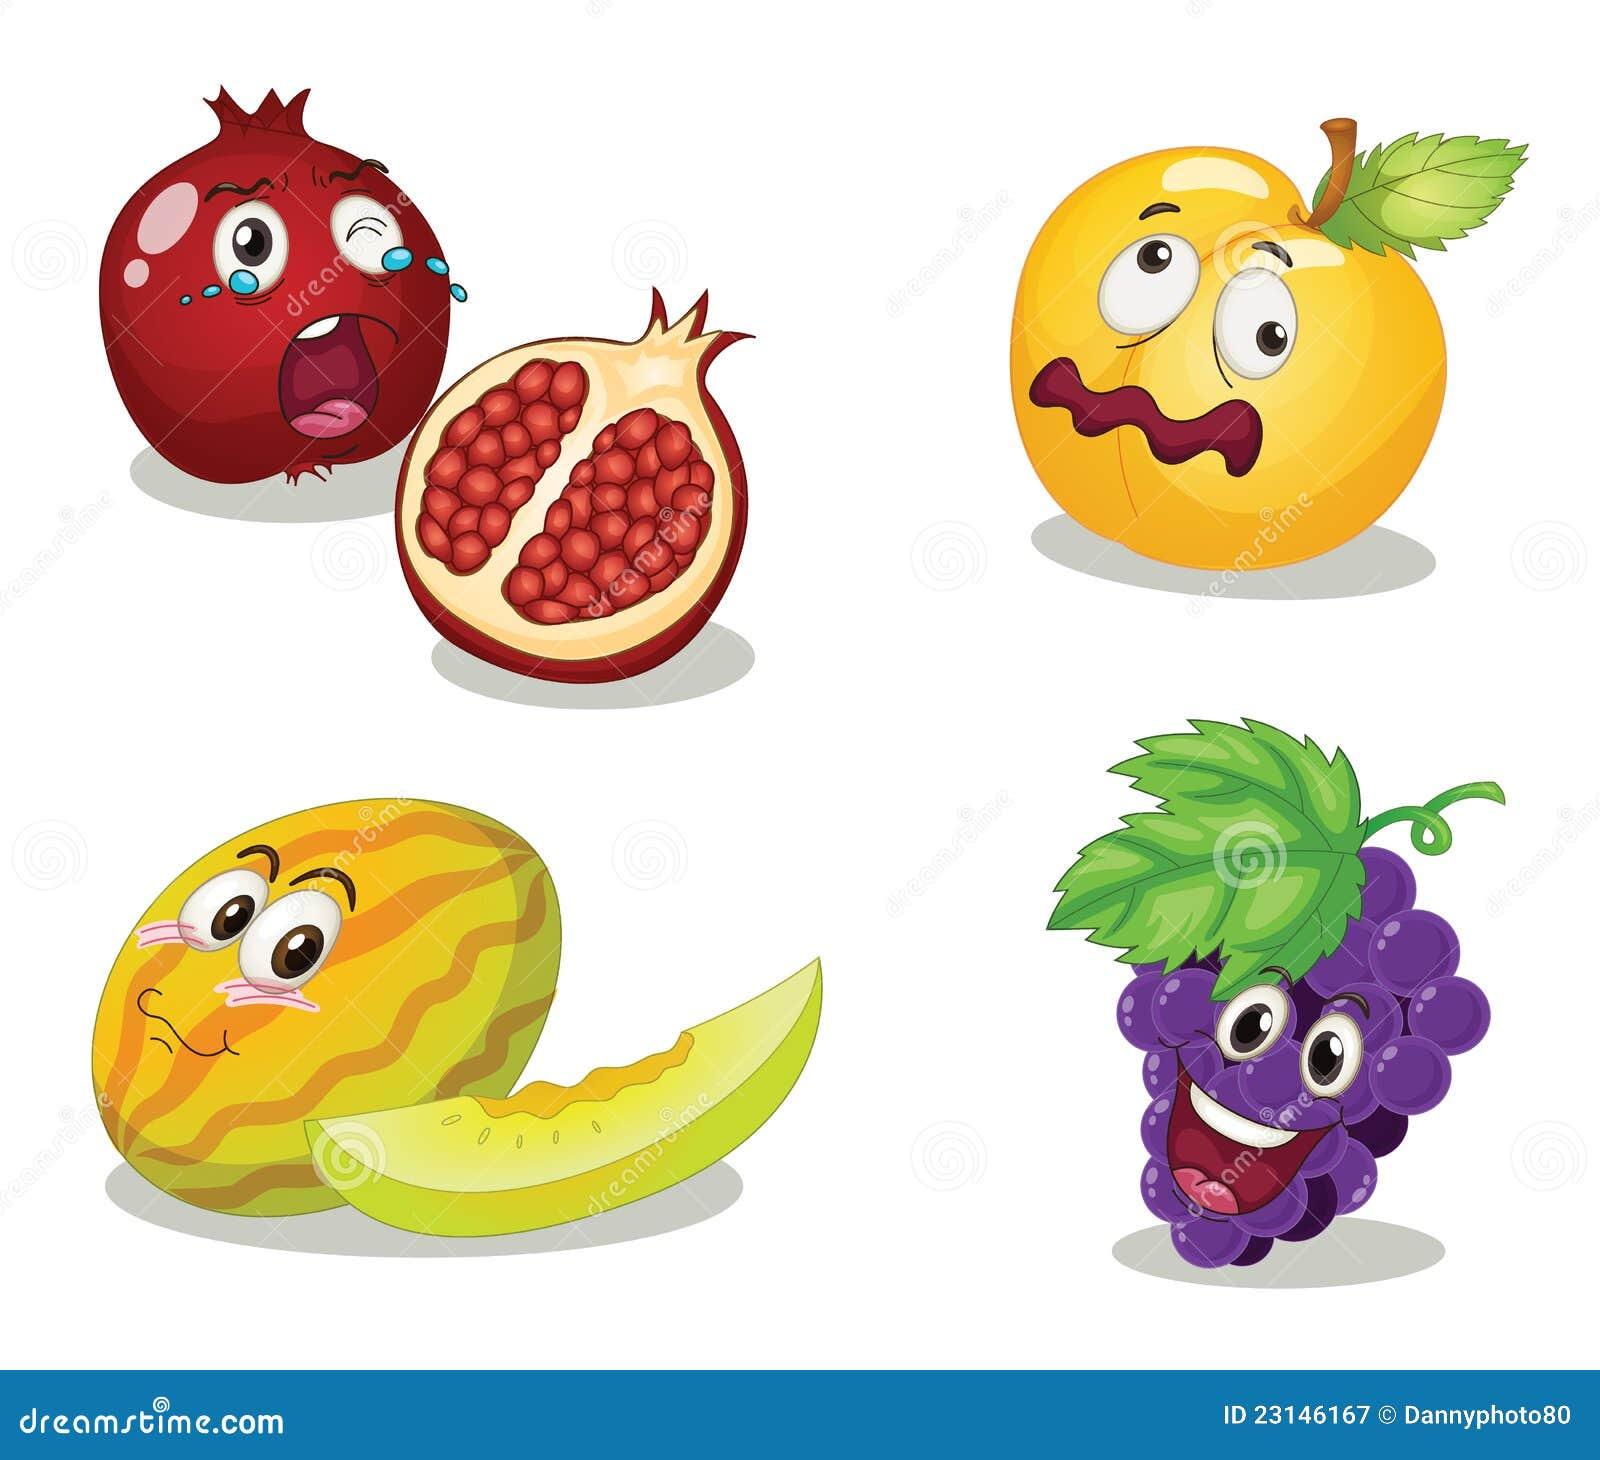 Basket Of Apples Clipart Fruit Faces Royalty Fr...